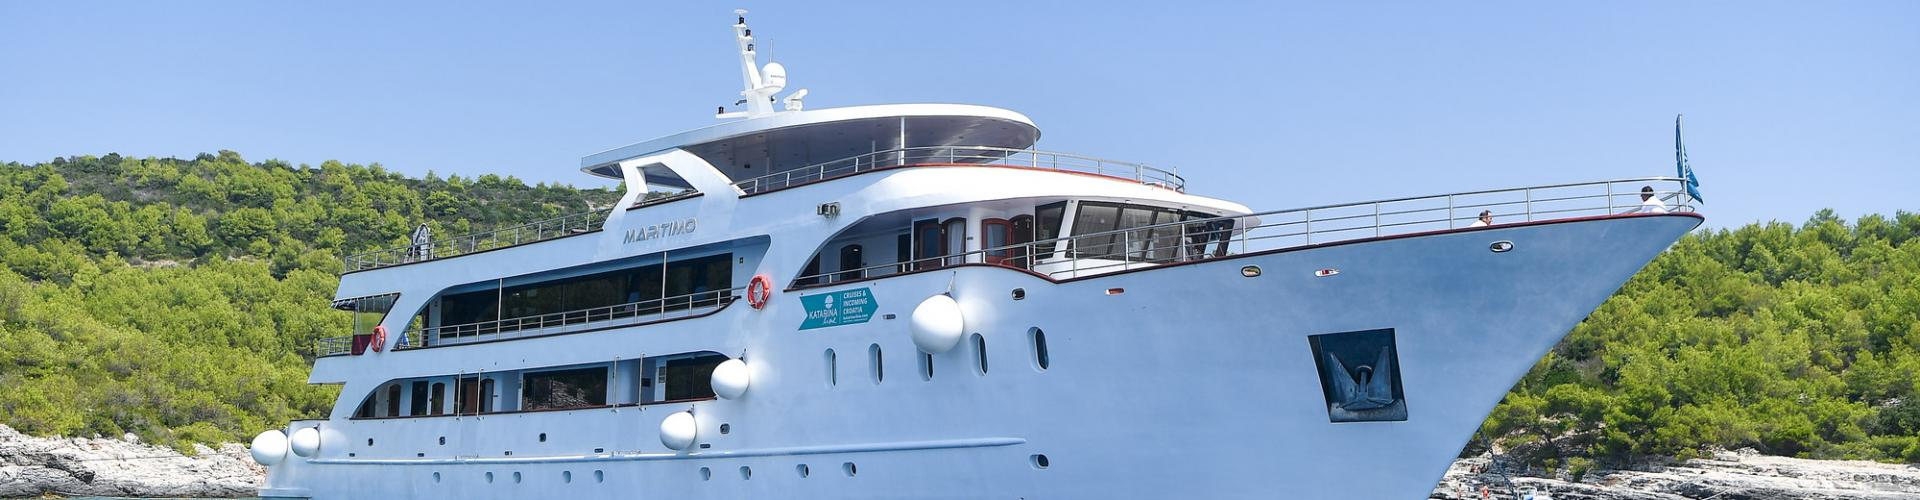 Deluxe Superior cruiser MV Maritimo- motor yacht